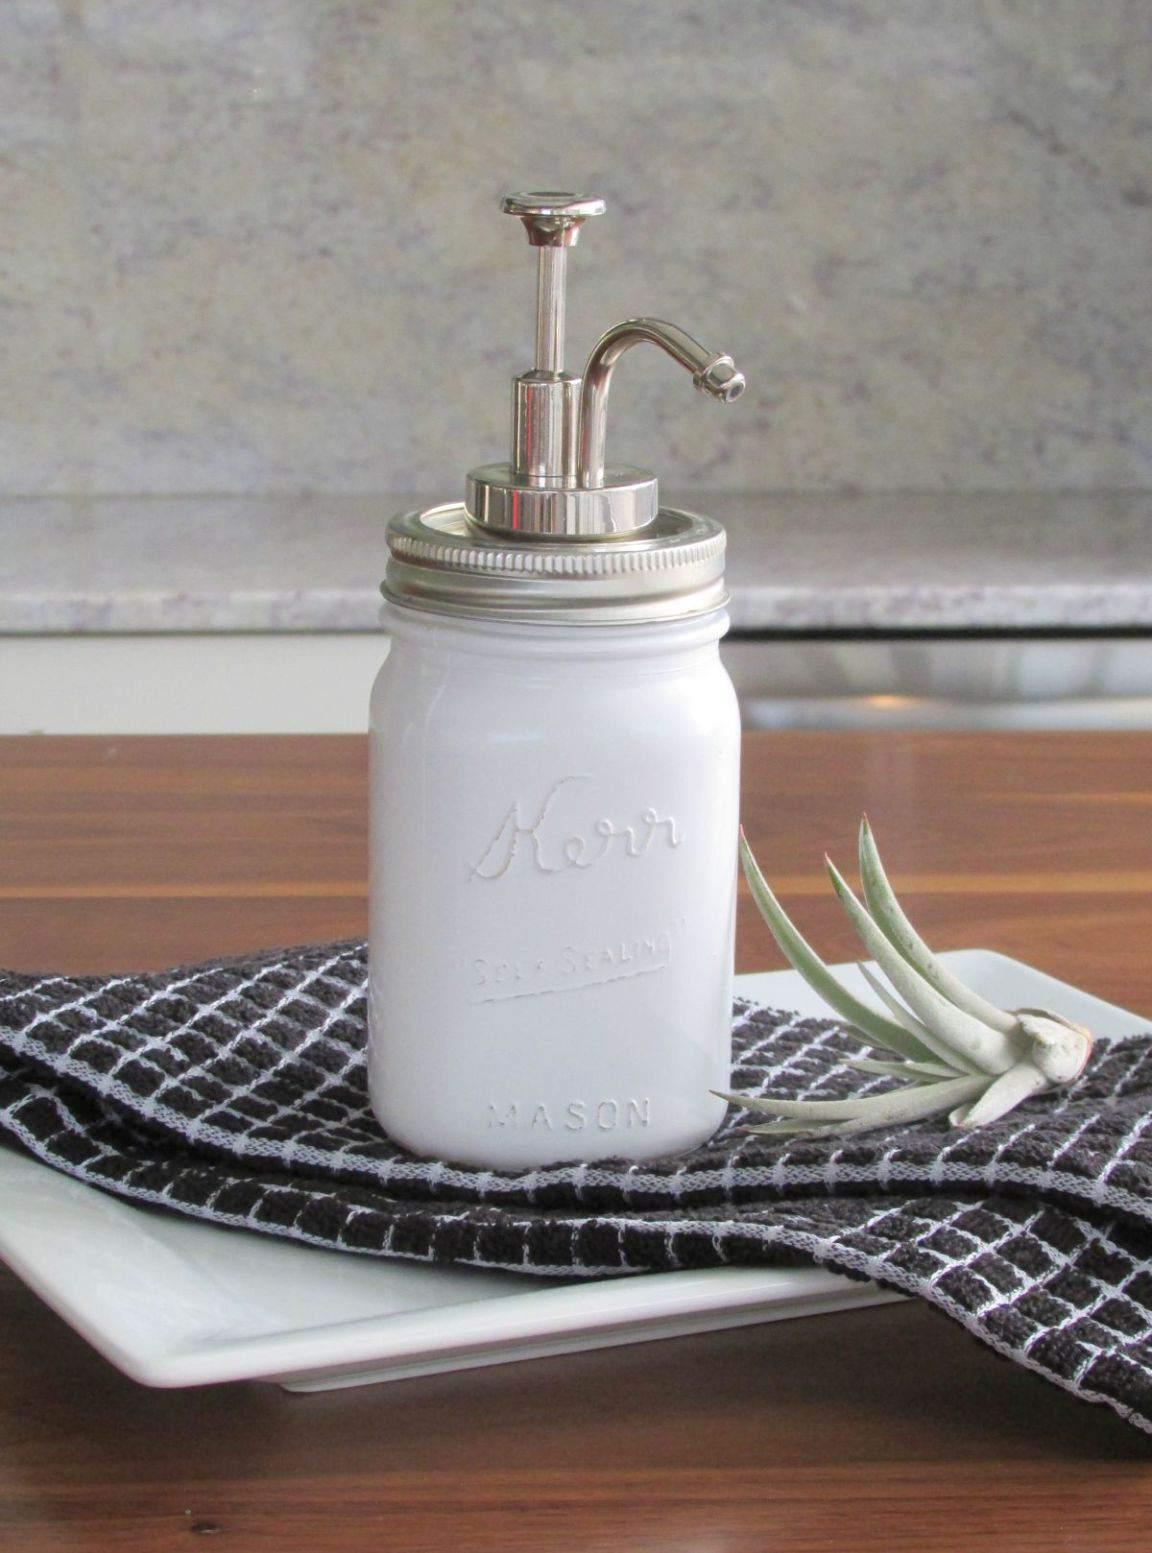 50 mason jar diy projects we love - Diy Mason Jar